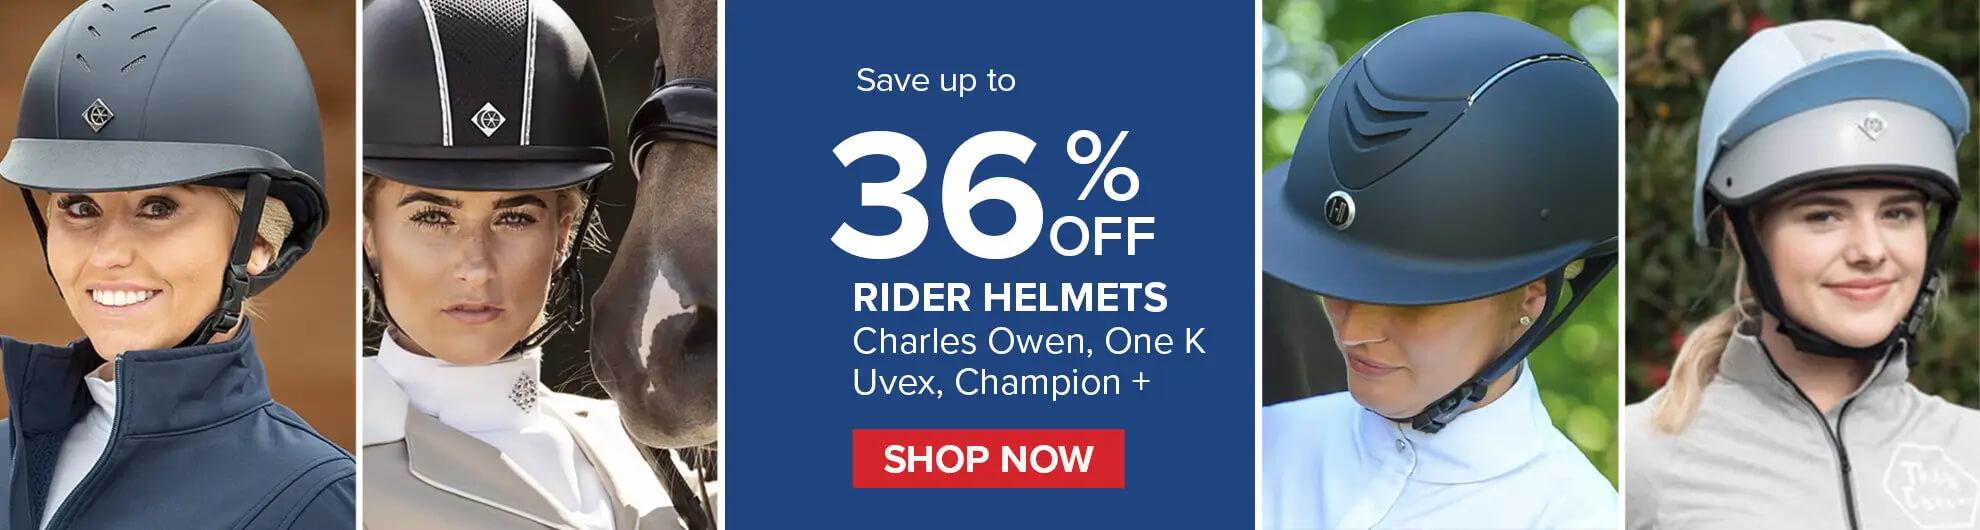 Top Equestrian Brand Riding Helmets on Bit of Britain